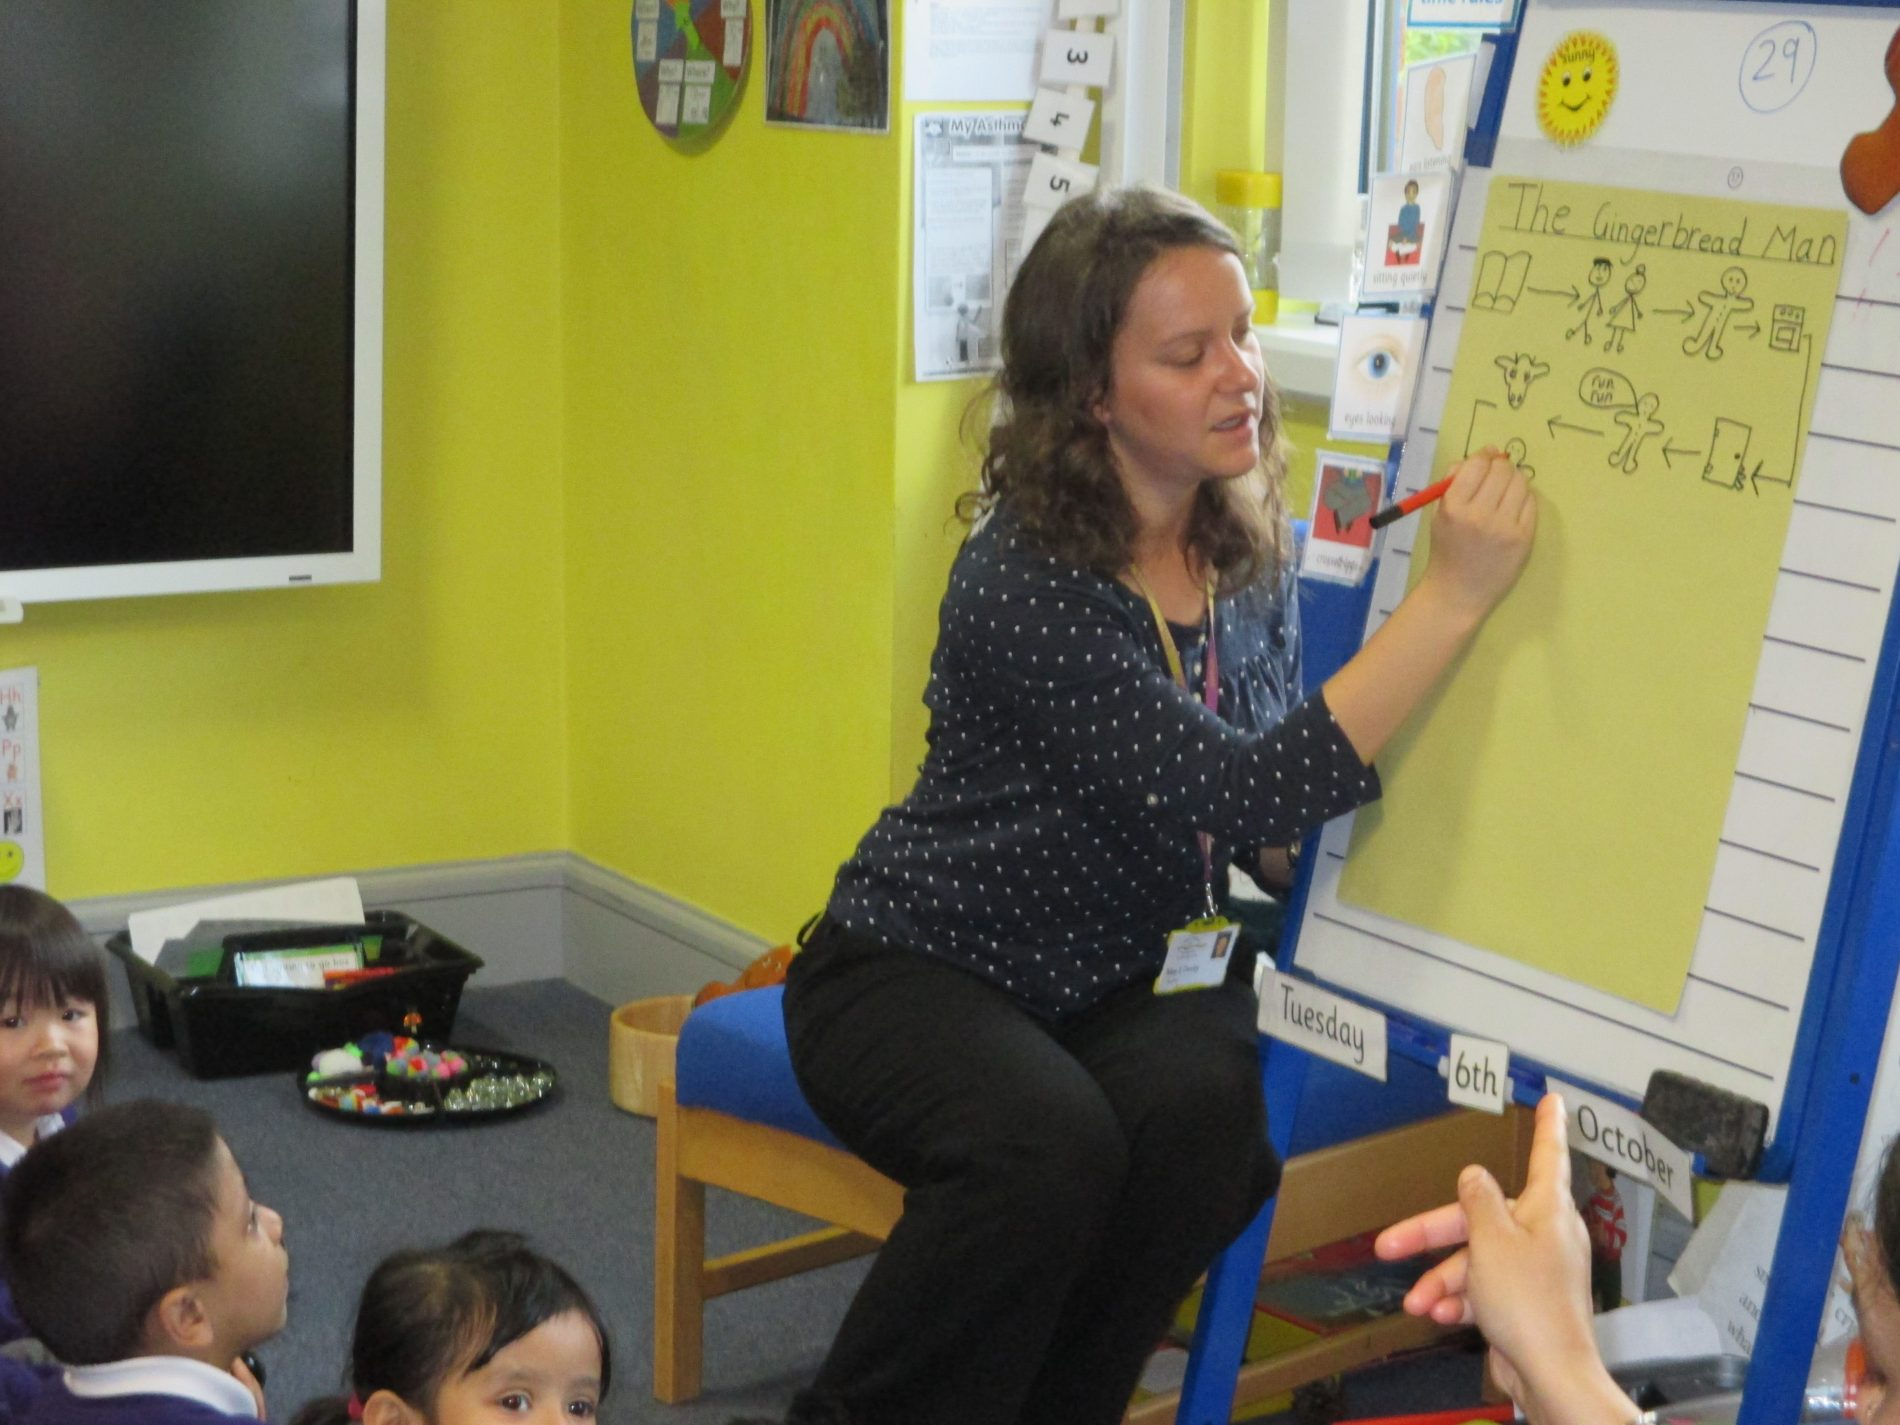 Teacher and flipchart Burnley Brow Community School